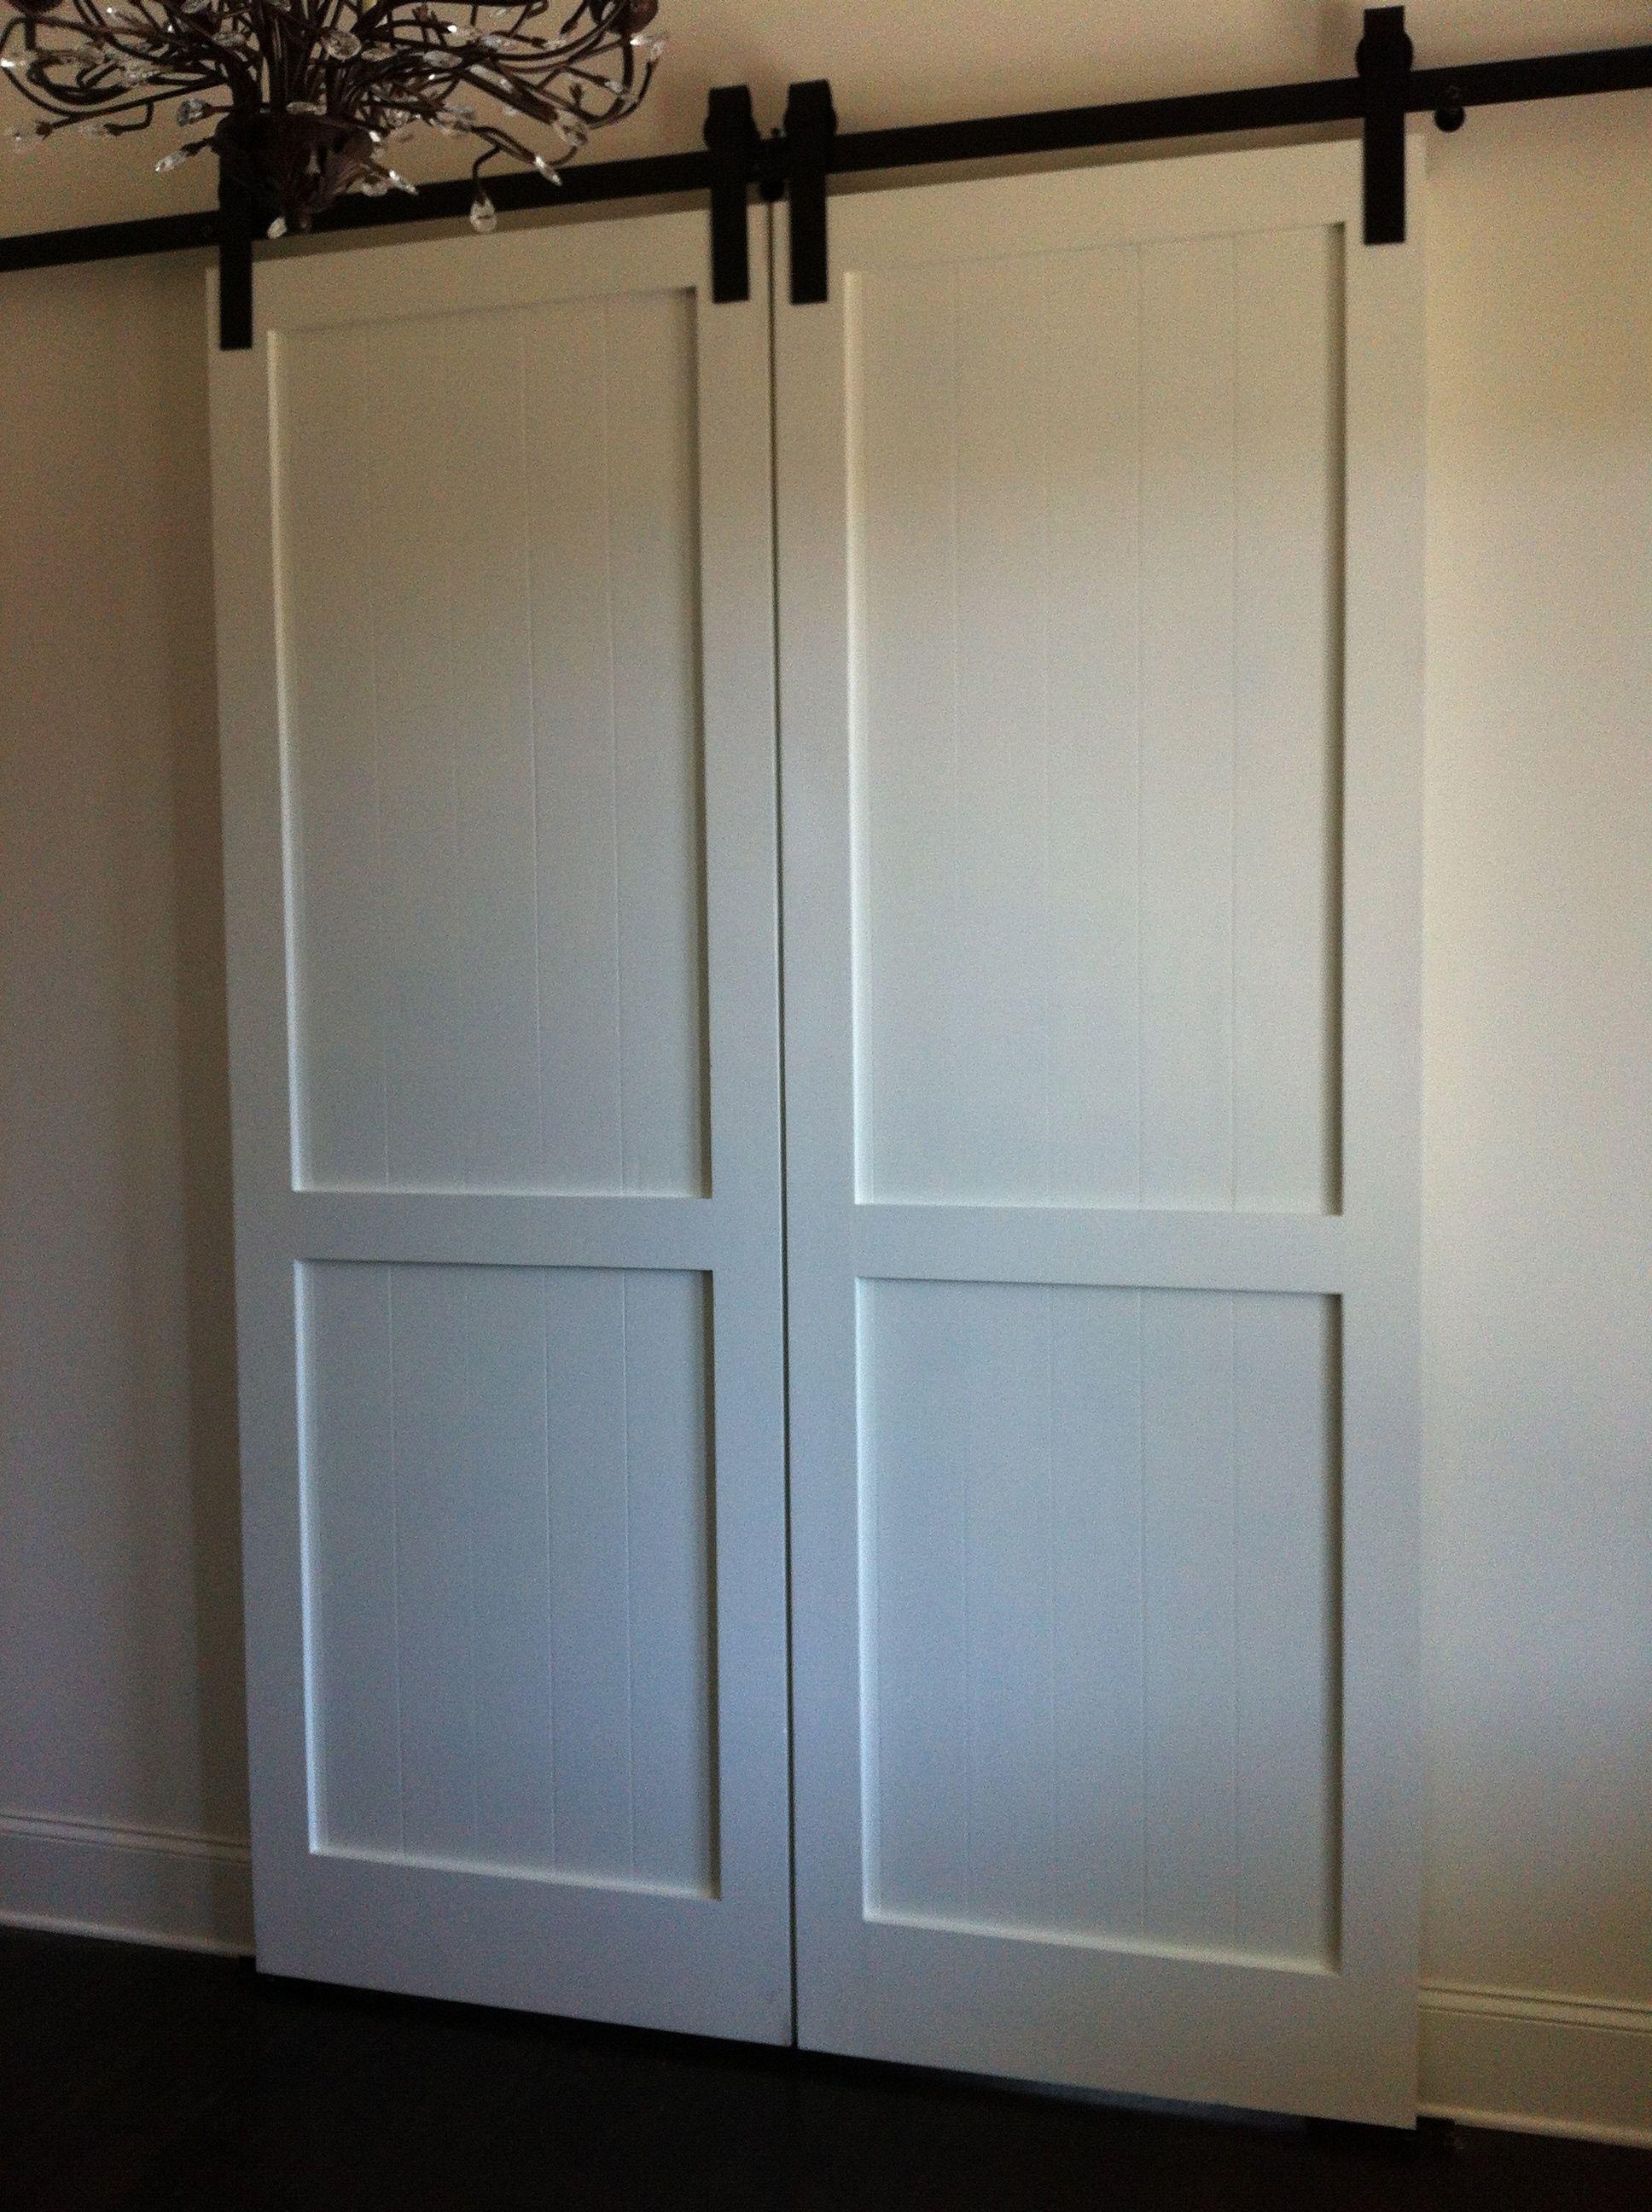 Pin By European Pine Furniture & Custom Barn Doors On Barn